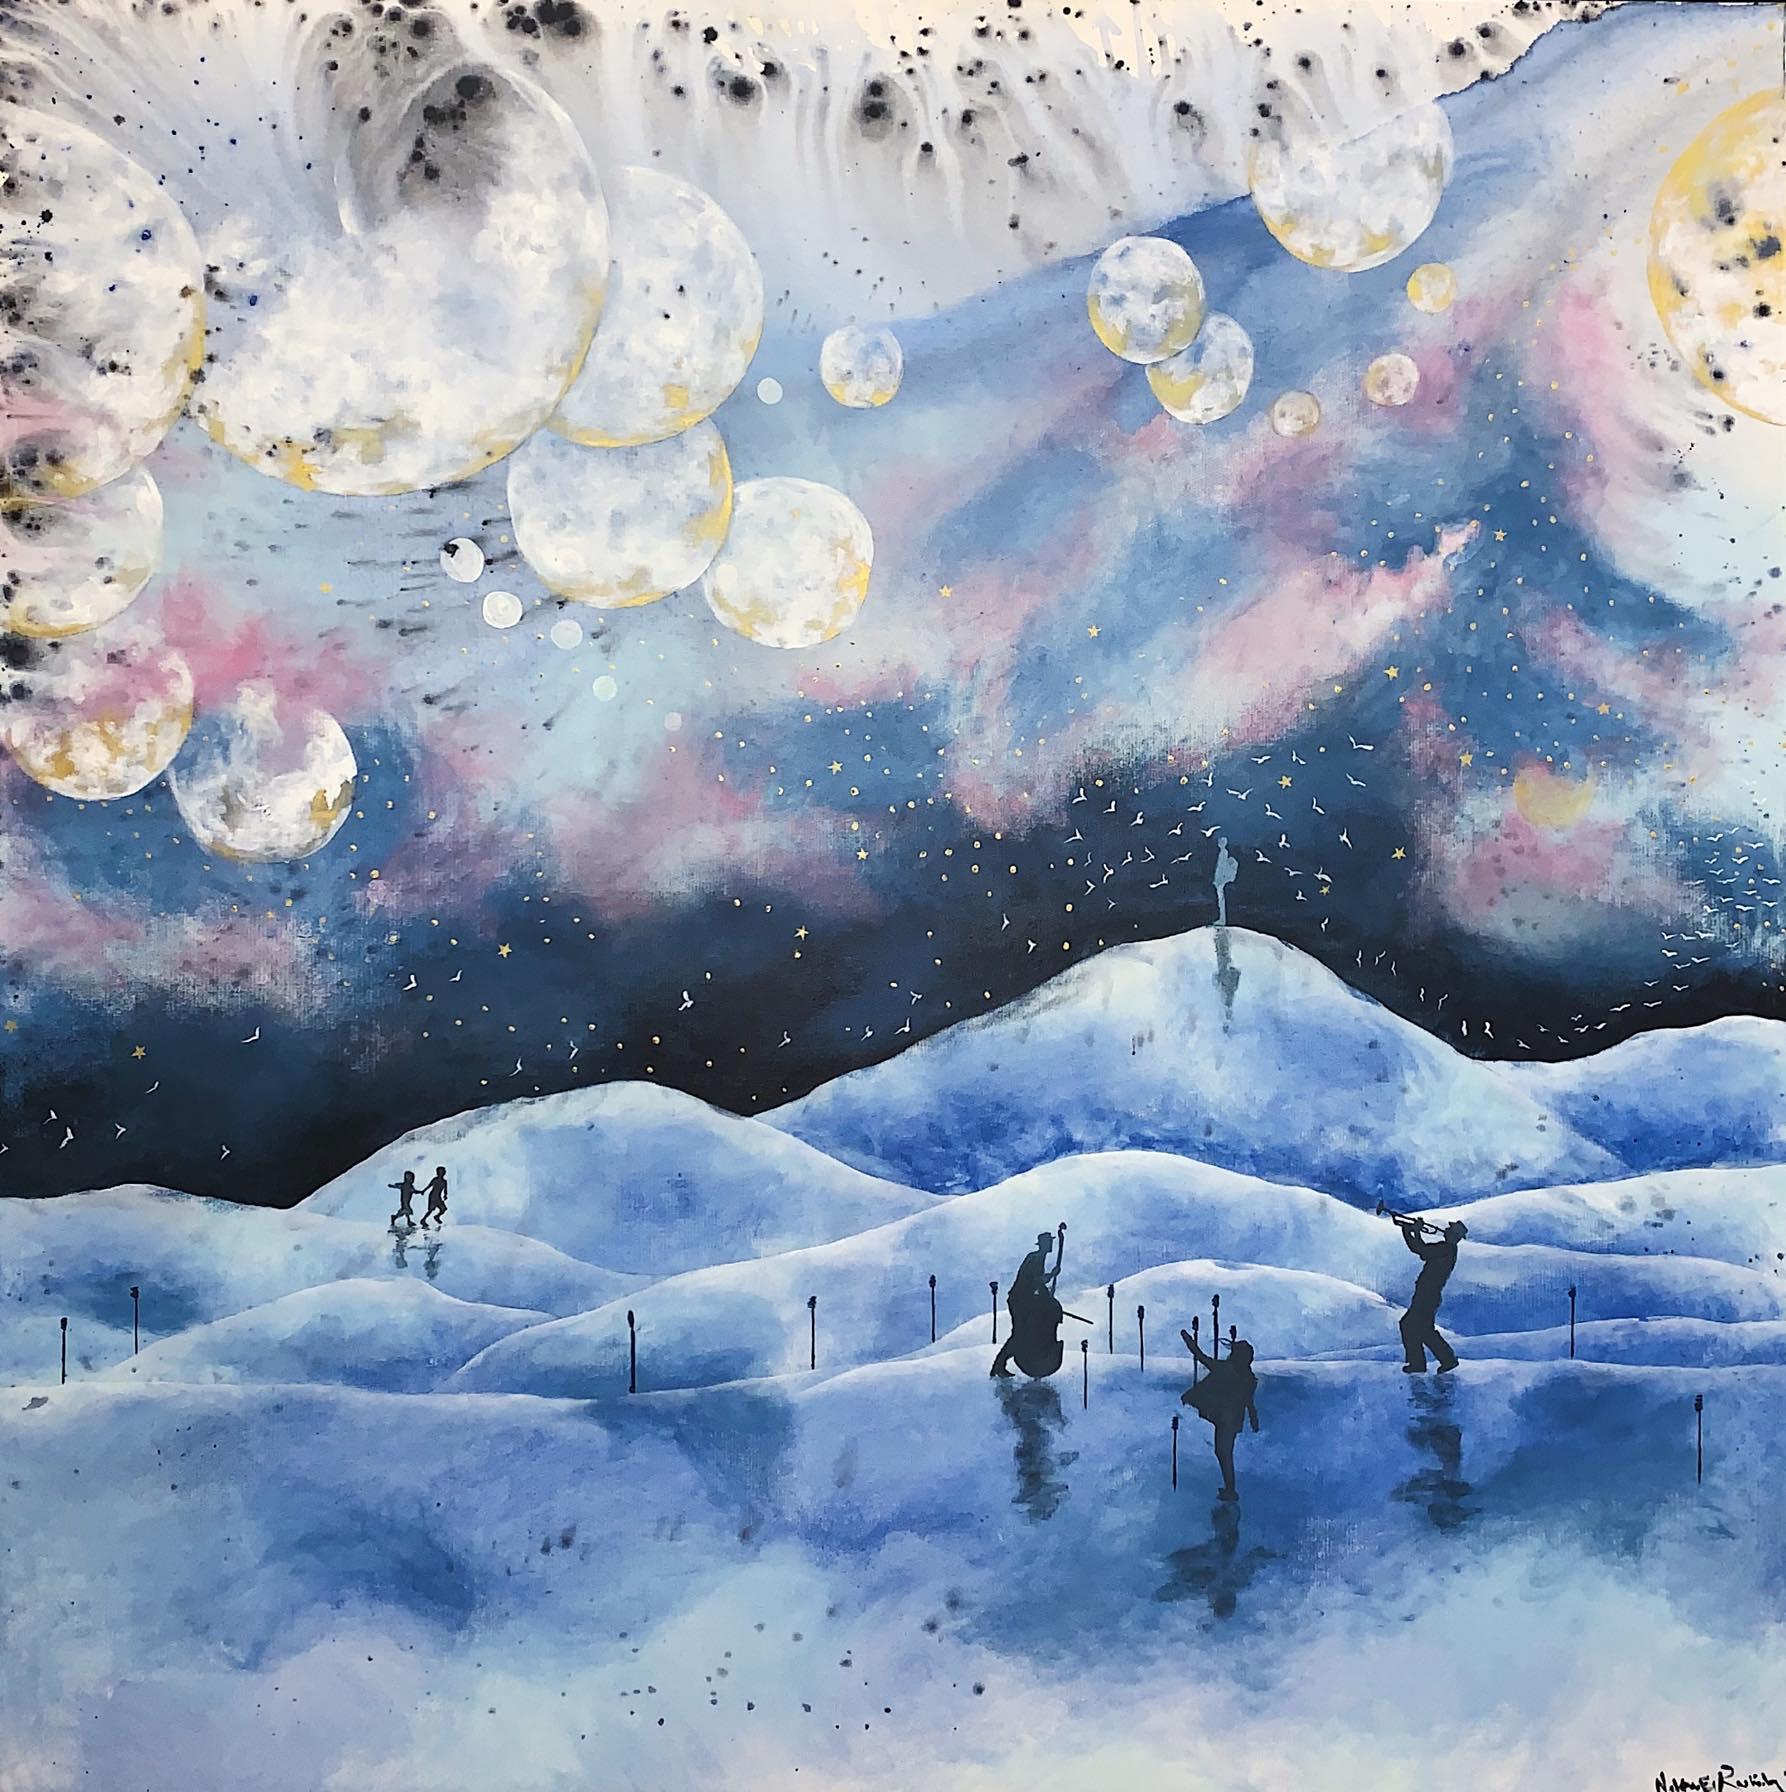 Nadeen El Rashidy, Just Listen, 2019, Oil on canvas, 150 x 150 cm.